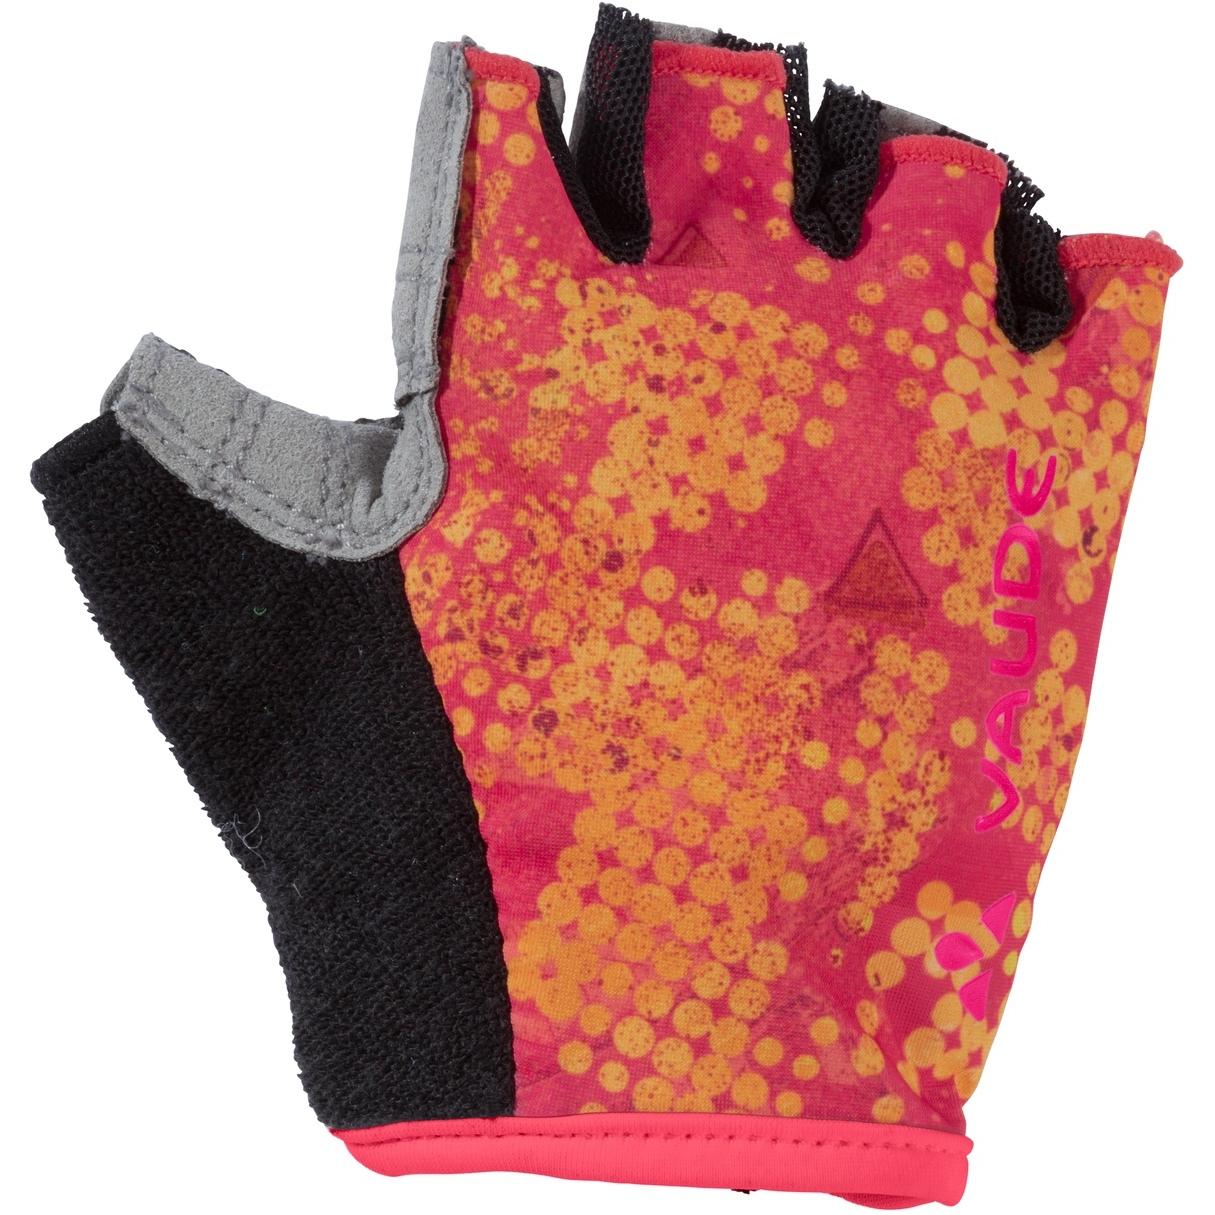 Vaude Grody Kinder Handschuhe - bright pink